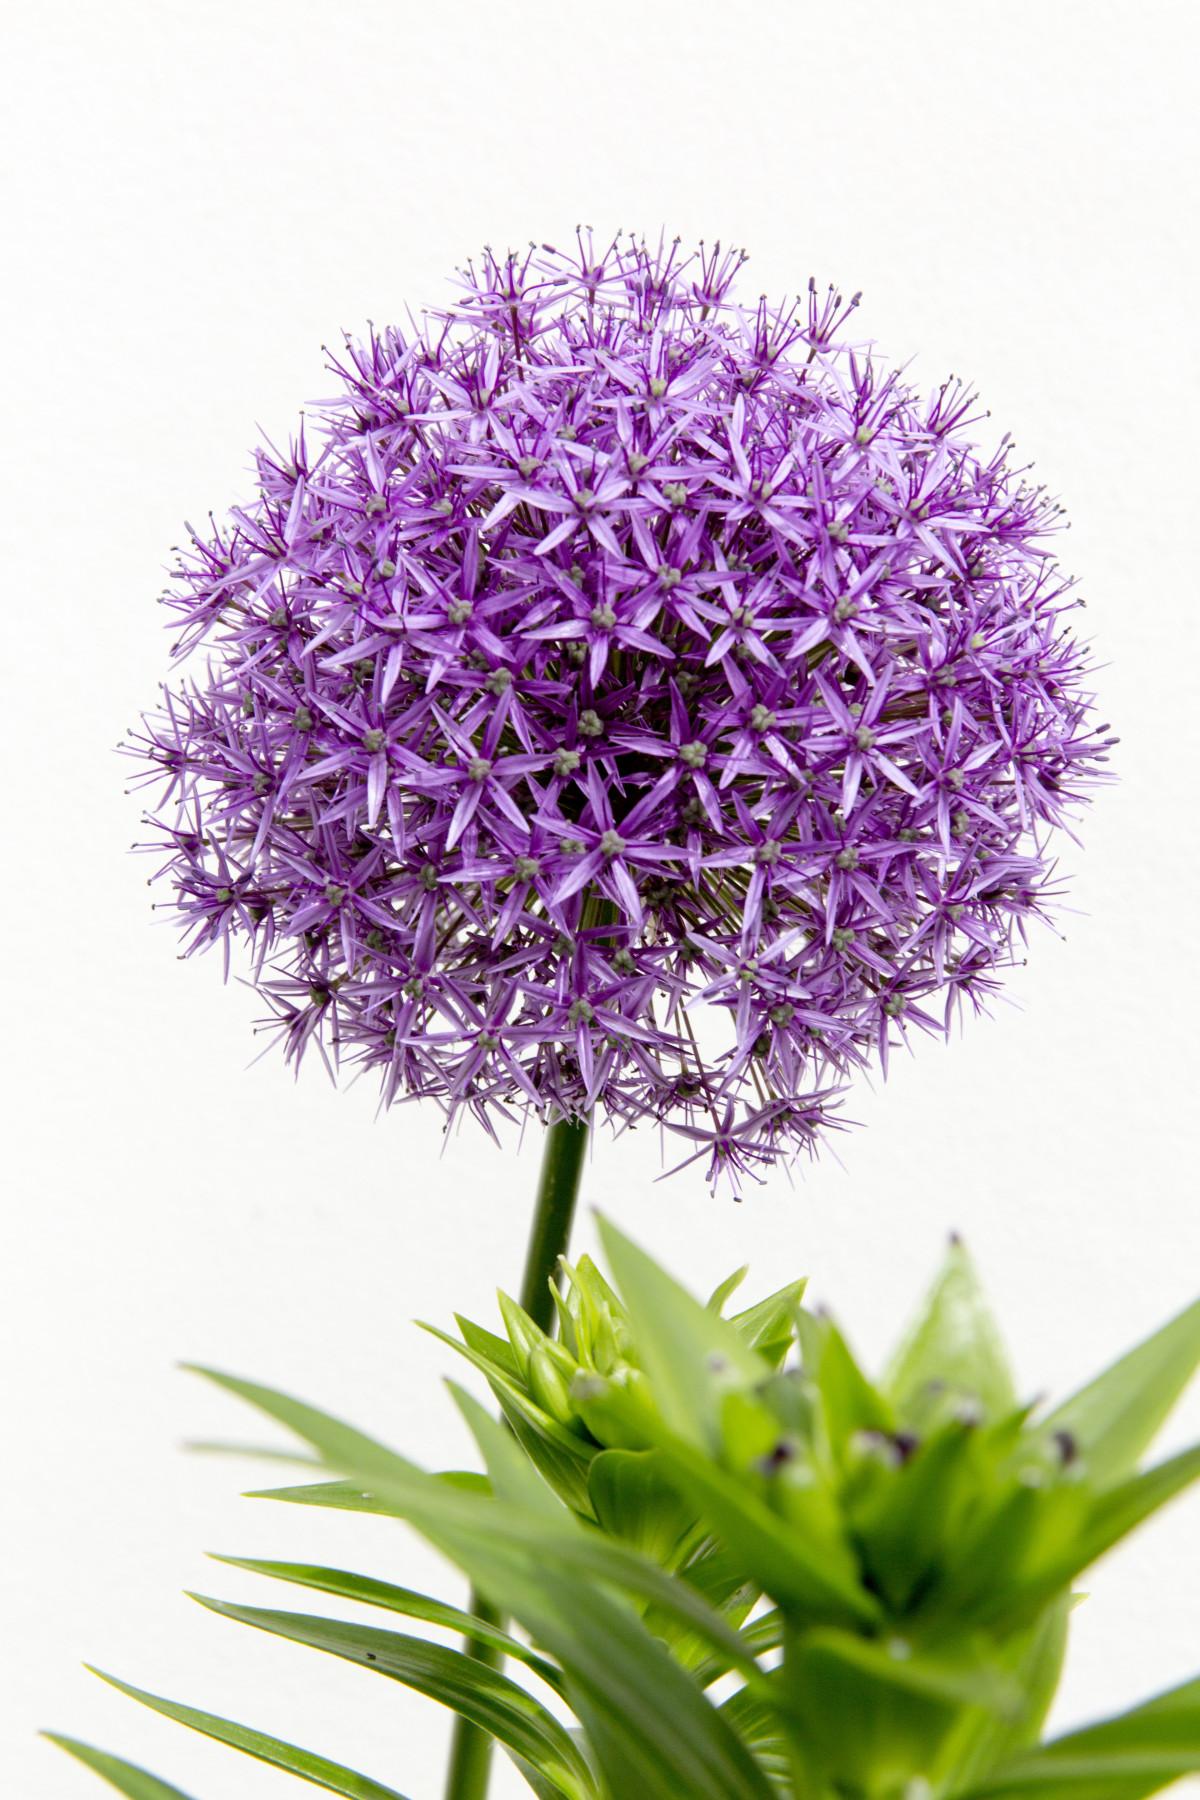 Fotos gratis flora lavanda flor silvestre - Lavanda clima ...